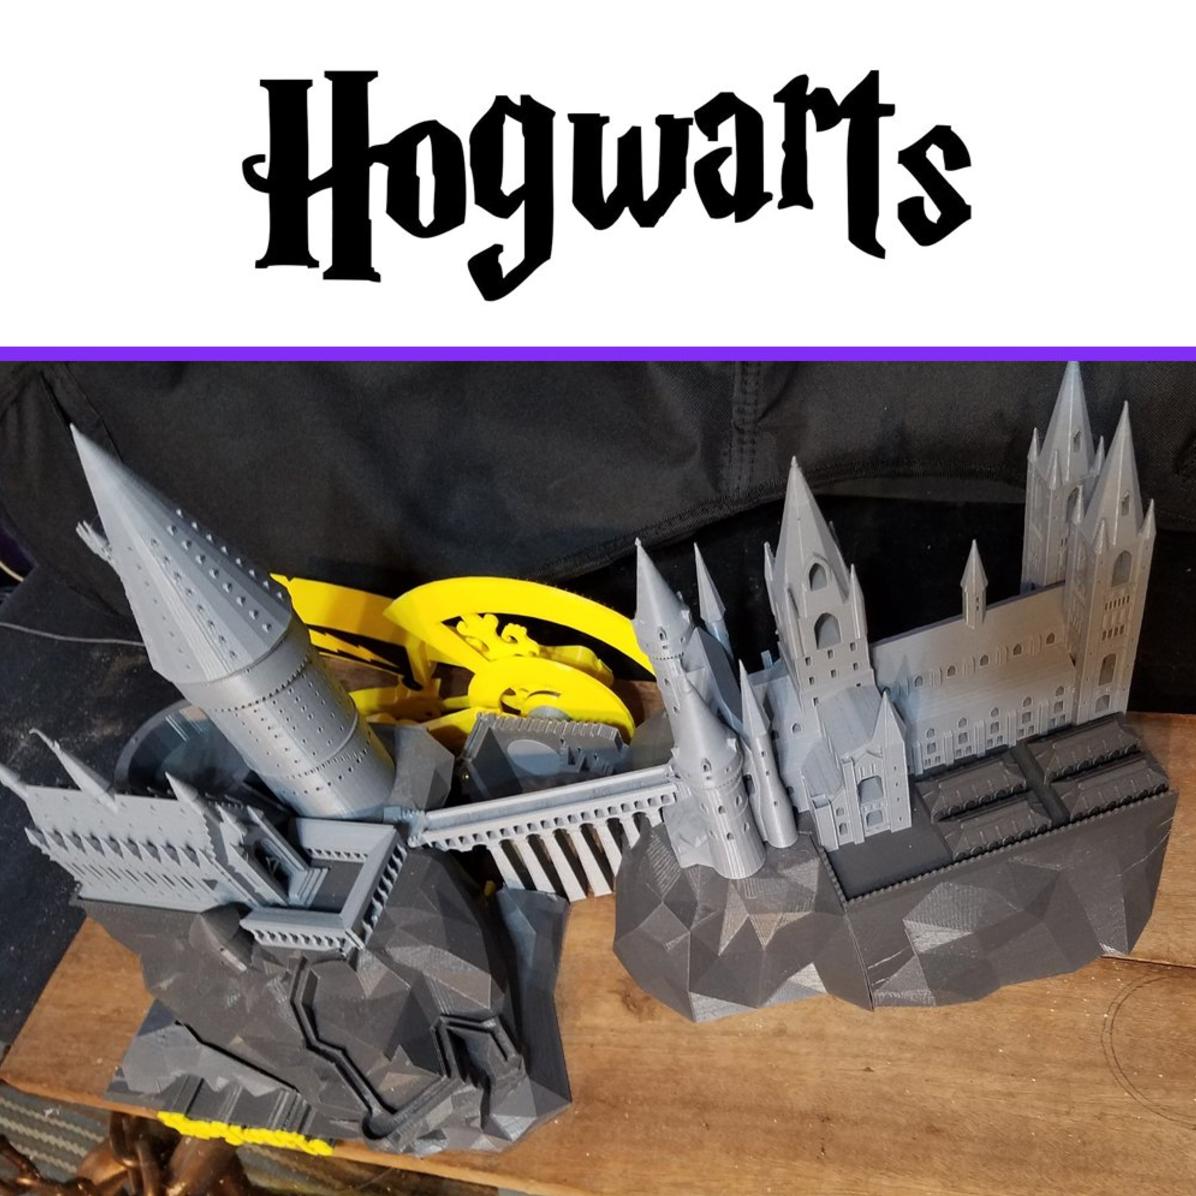 Capture d'écran 2017-06-19 à 10.43.32.png Download free STL file Hogwarts School of Witchcraft • 3D printer template, Valient